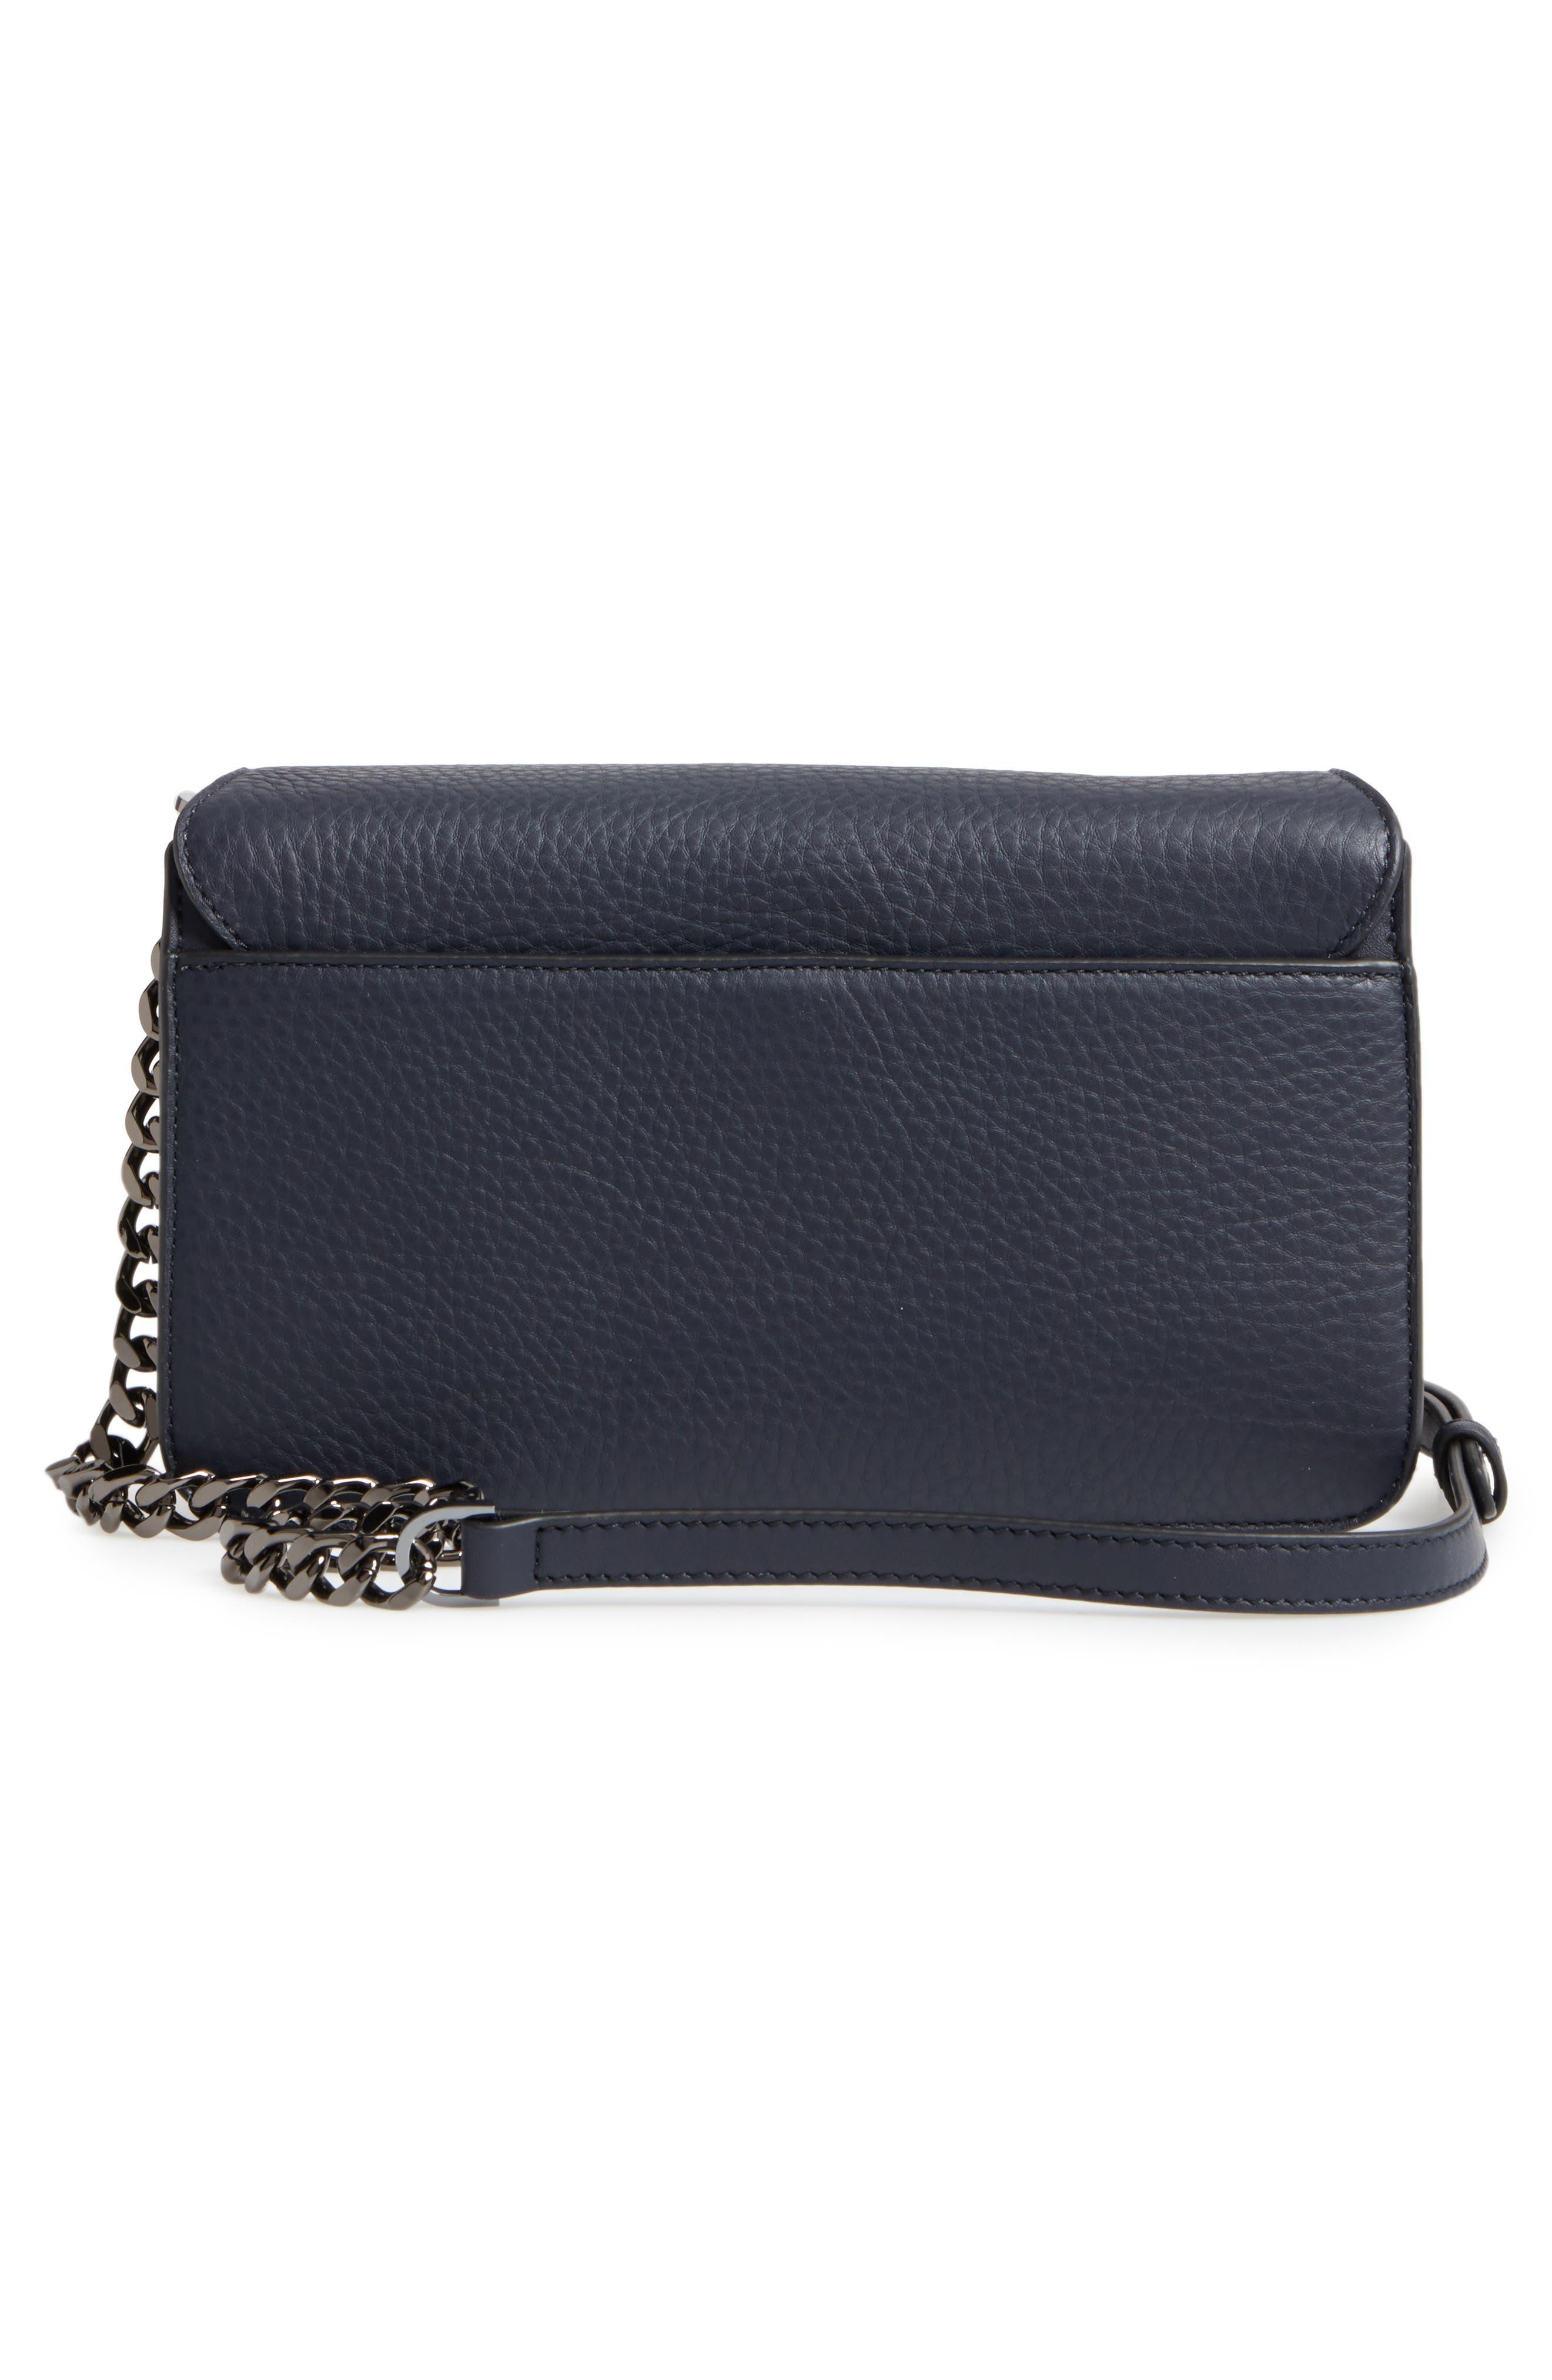 Cortney Nappa Leather Shoulder/Crossbody Bag,                             Alternate thumbnail 12, color,